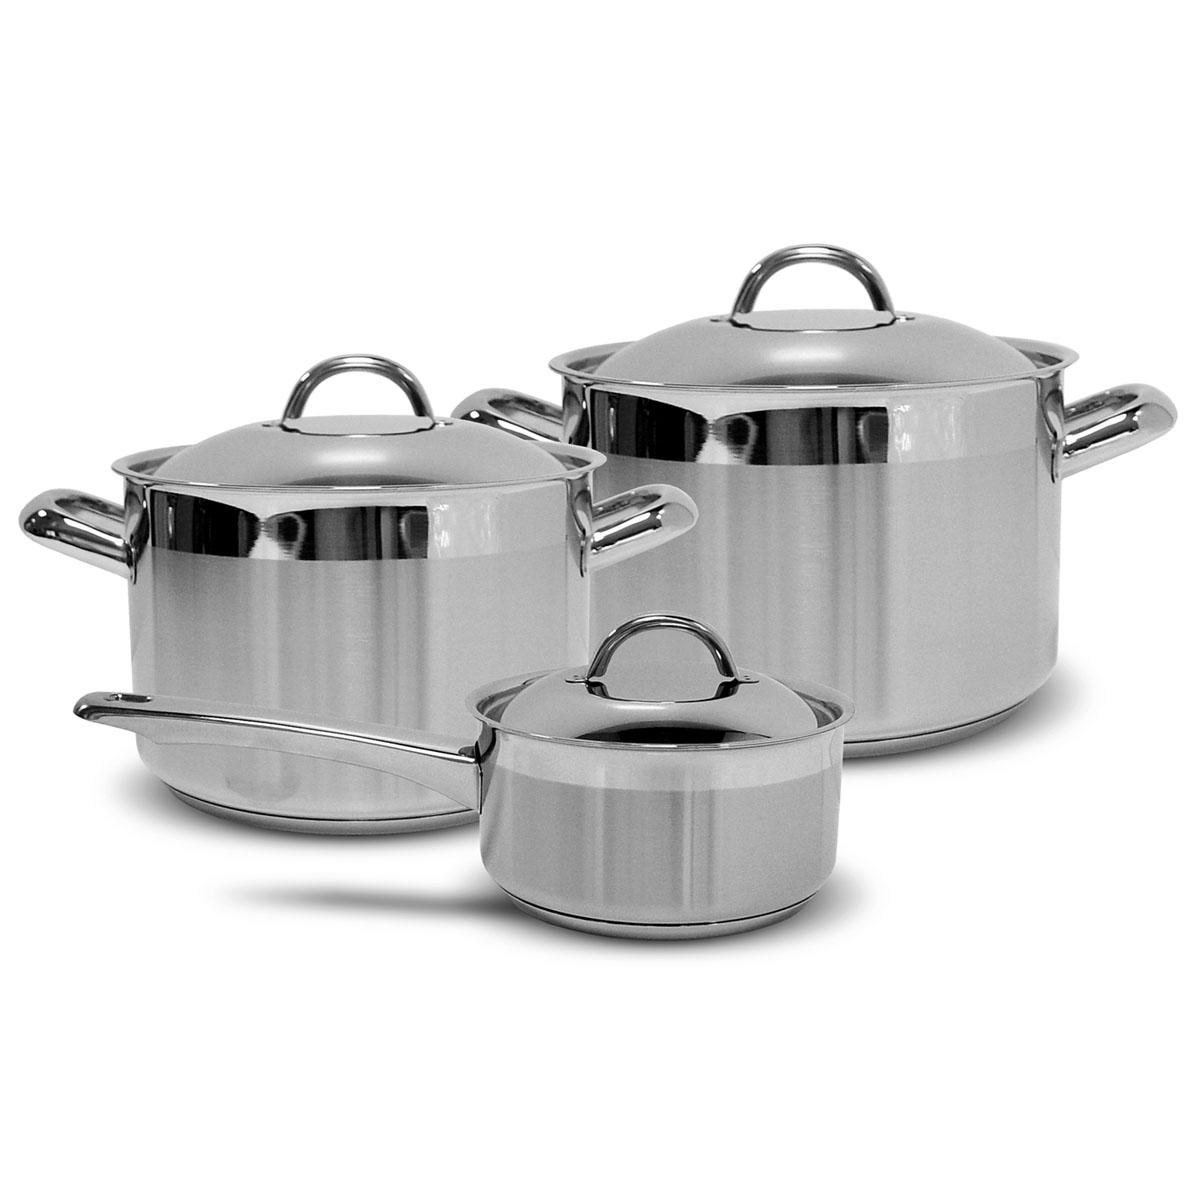 Набор посуды Silampos Европа, 6 предметовCM000001328632123BM0217 Набор 3пр.ЕВРОПА Характеристики: Материал: сталь.Размер: 330*300*210мм.Артикул: 632123BM0217.